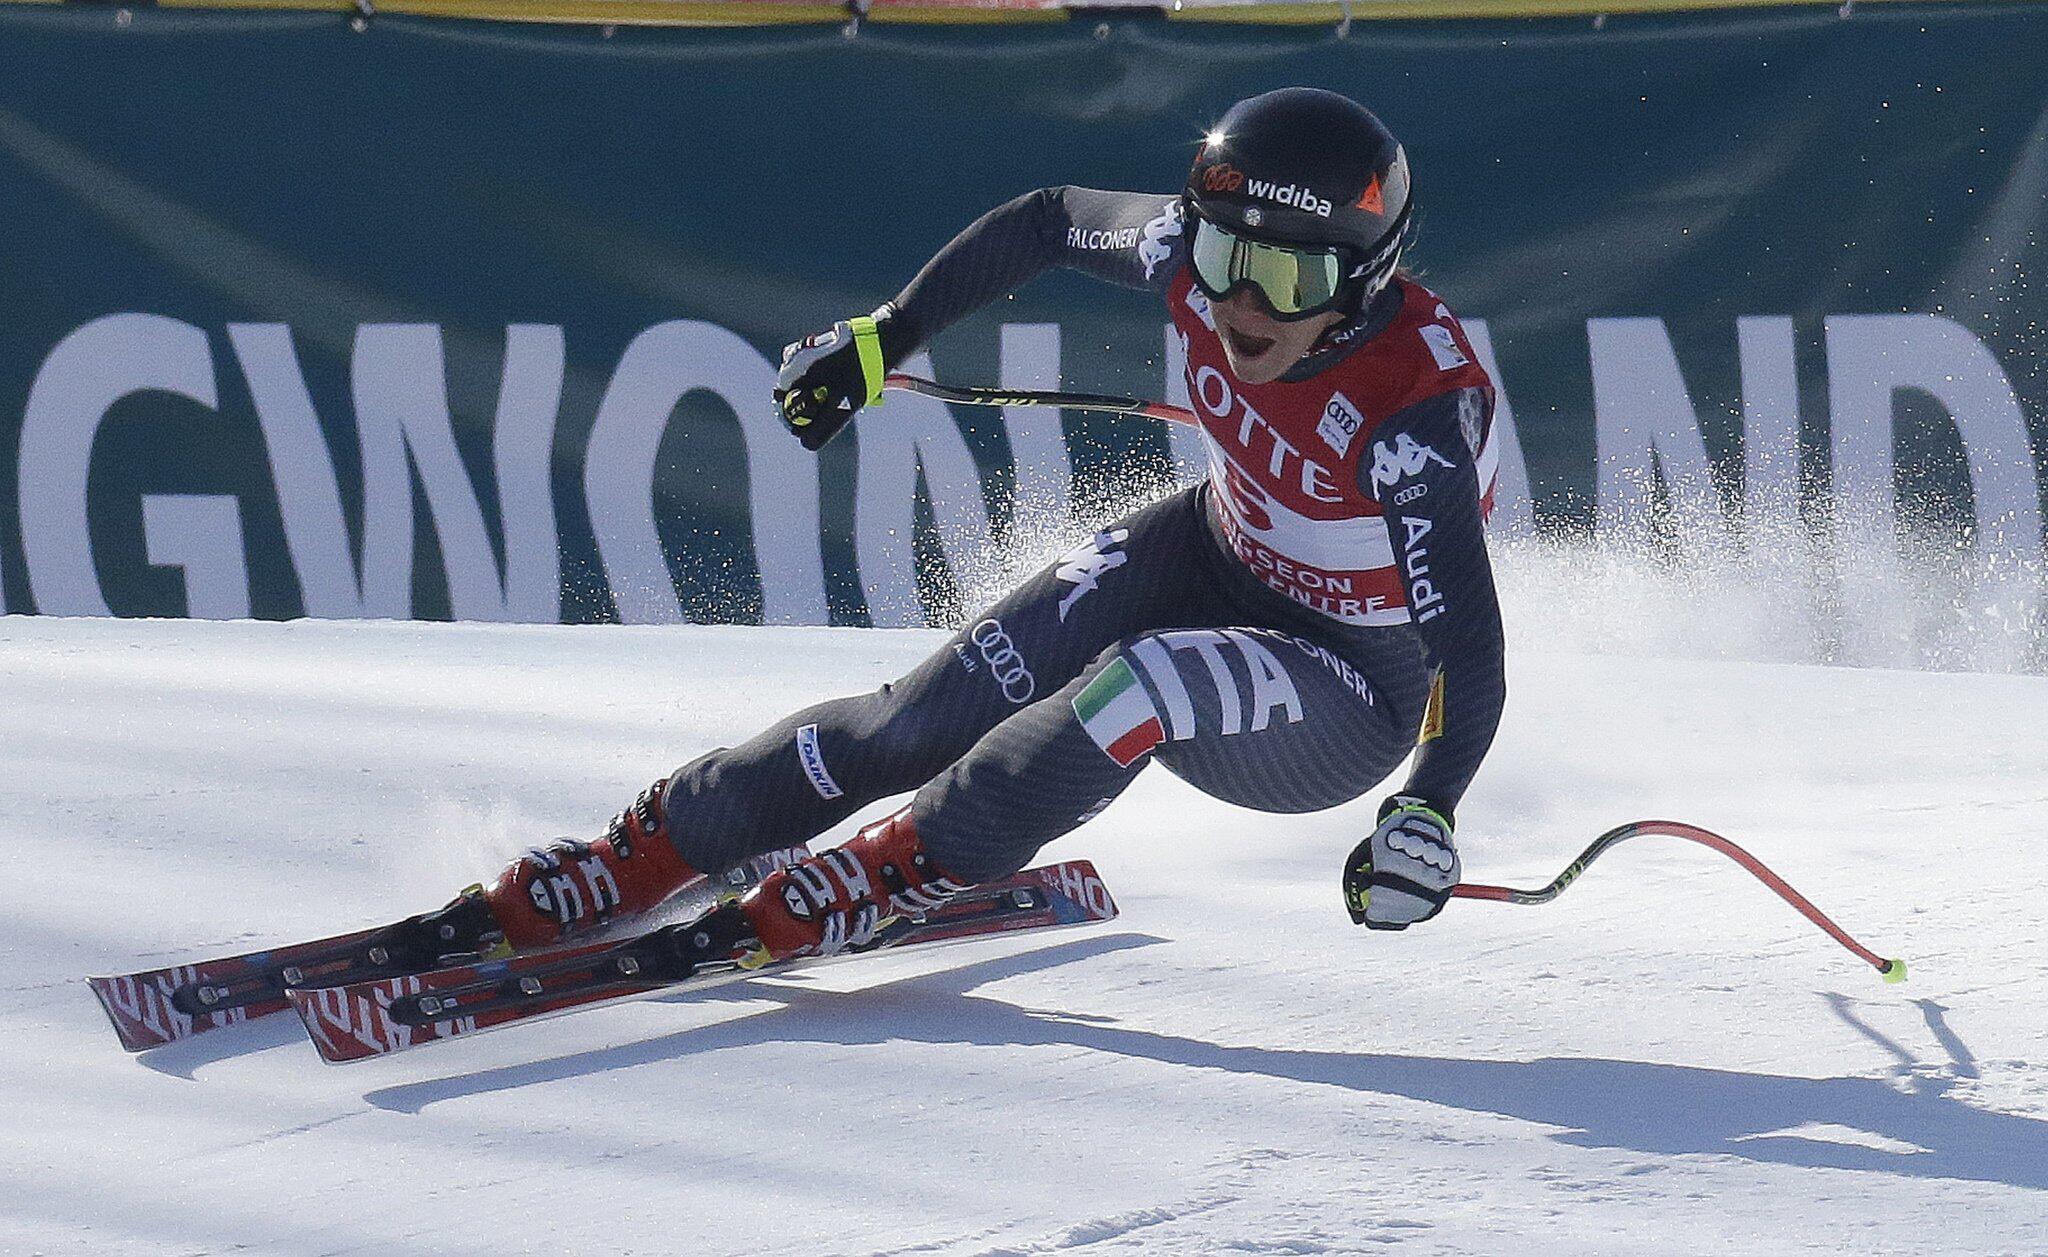 Bild zu Ski Alpin - Abfahrt Damen